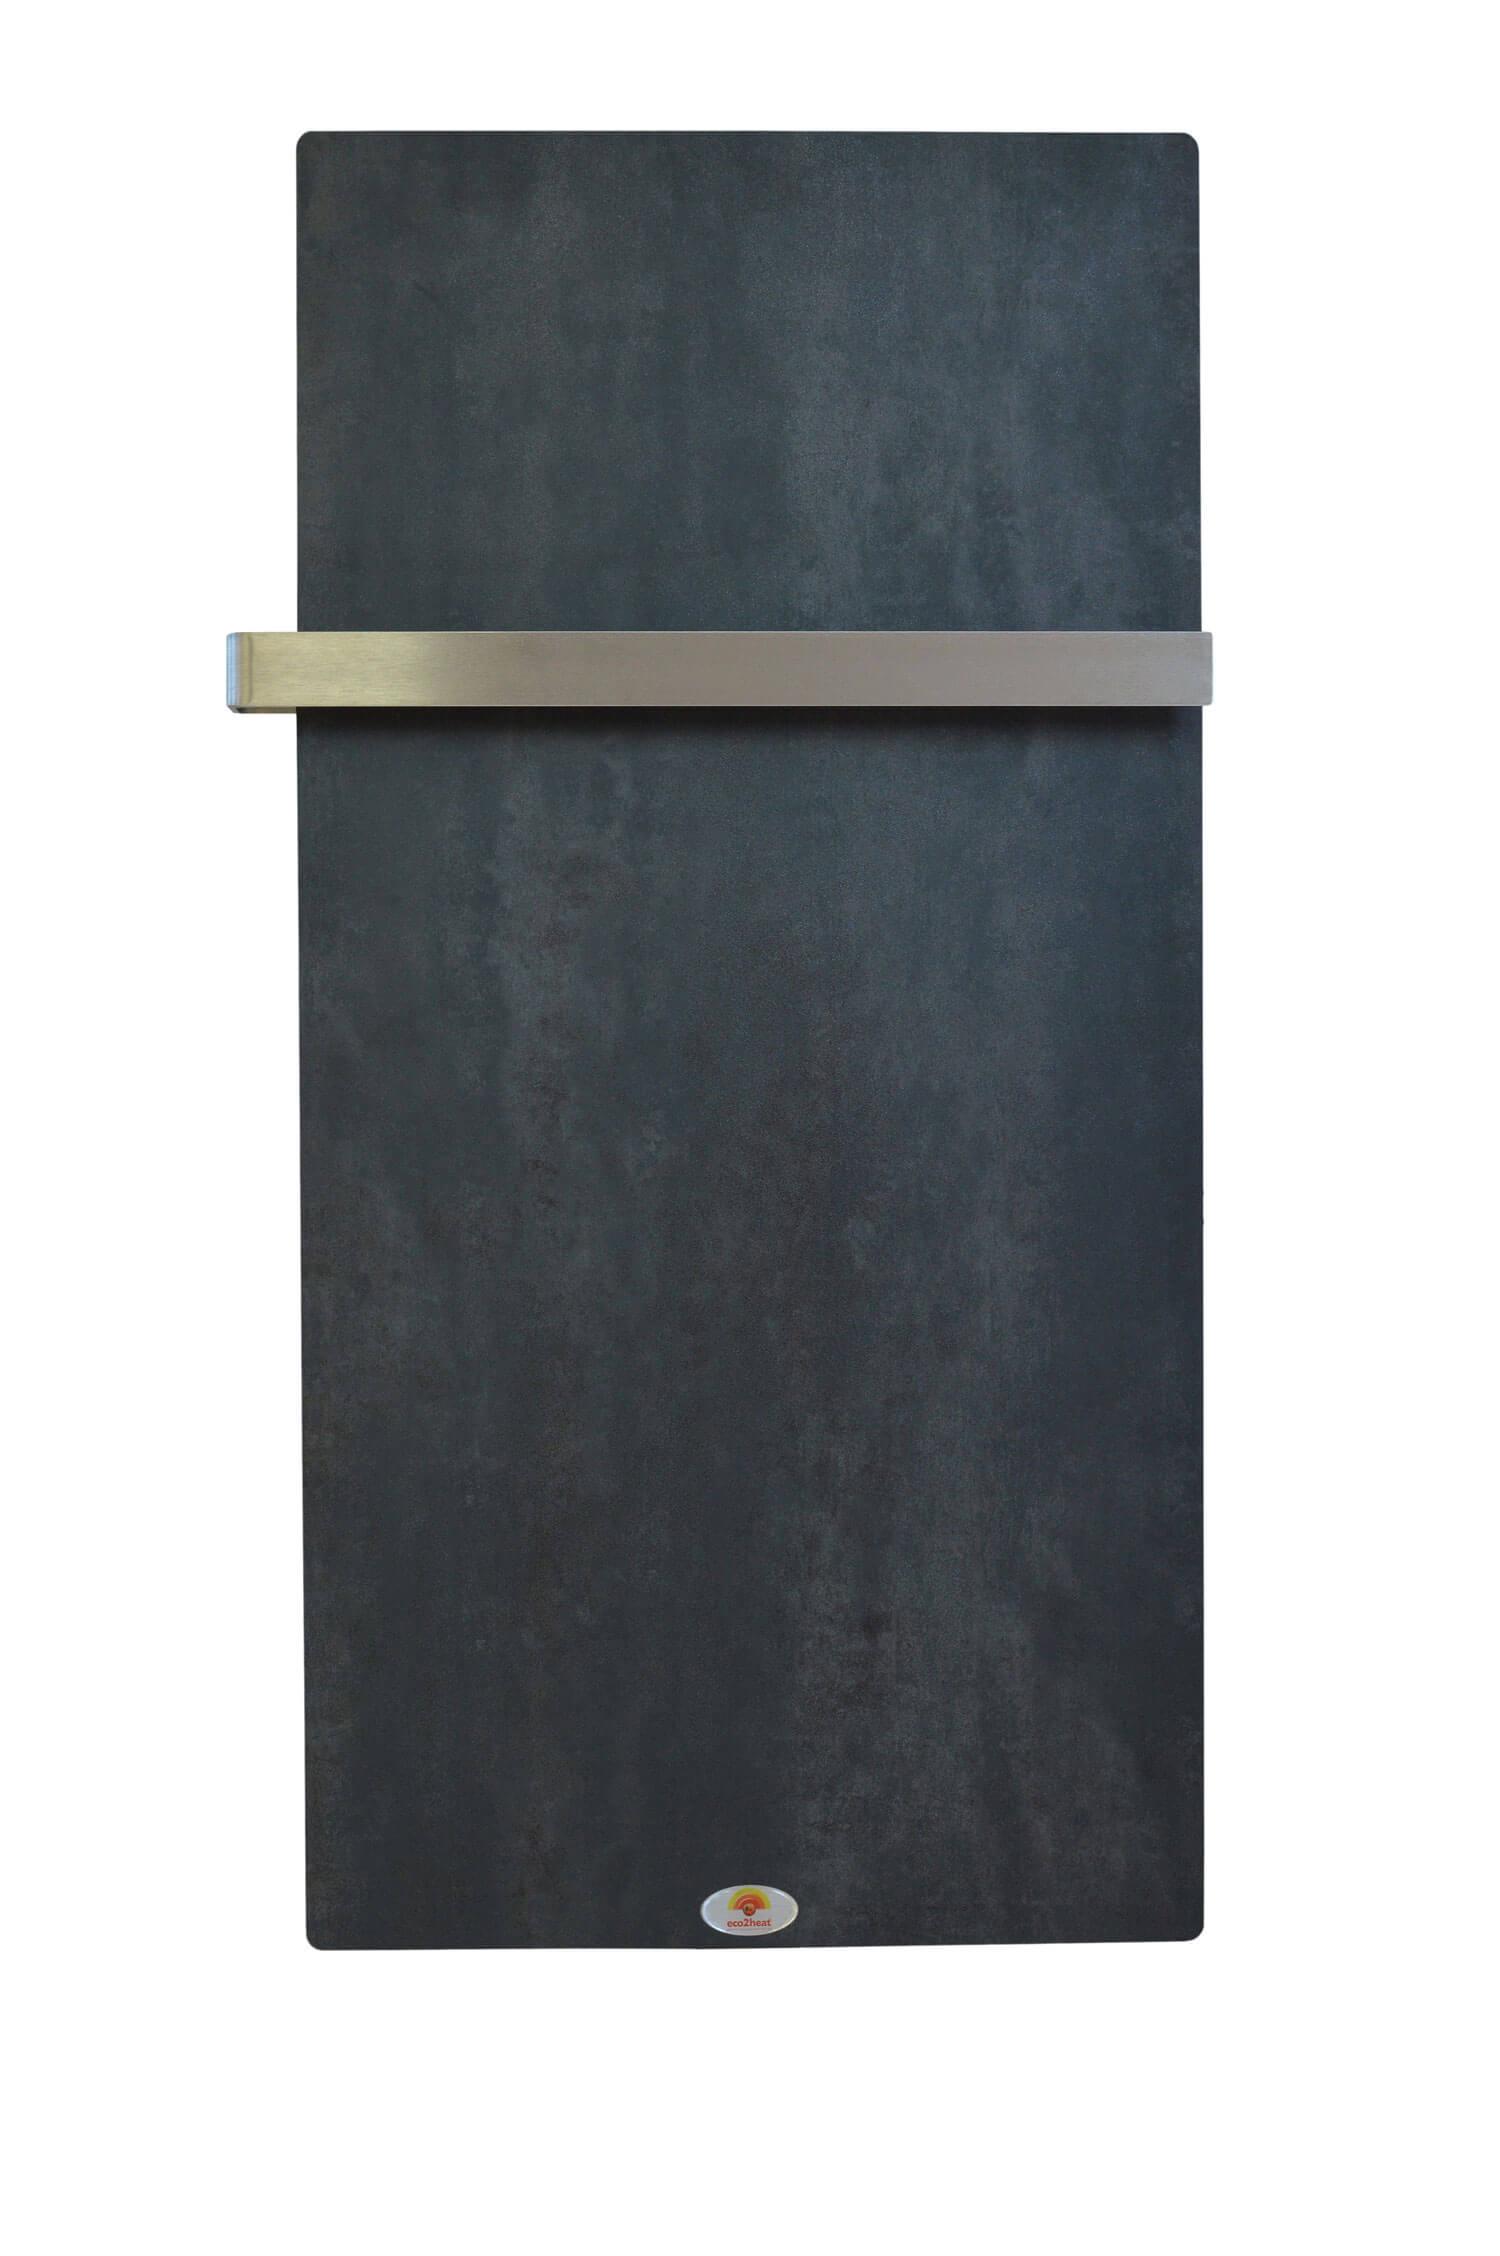 infrarot keramik badheizung mit handtuchhalter. Black Bedroom Furniture Sets. Home Design Ideas